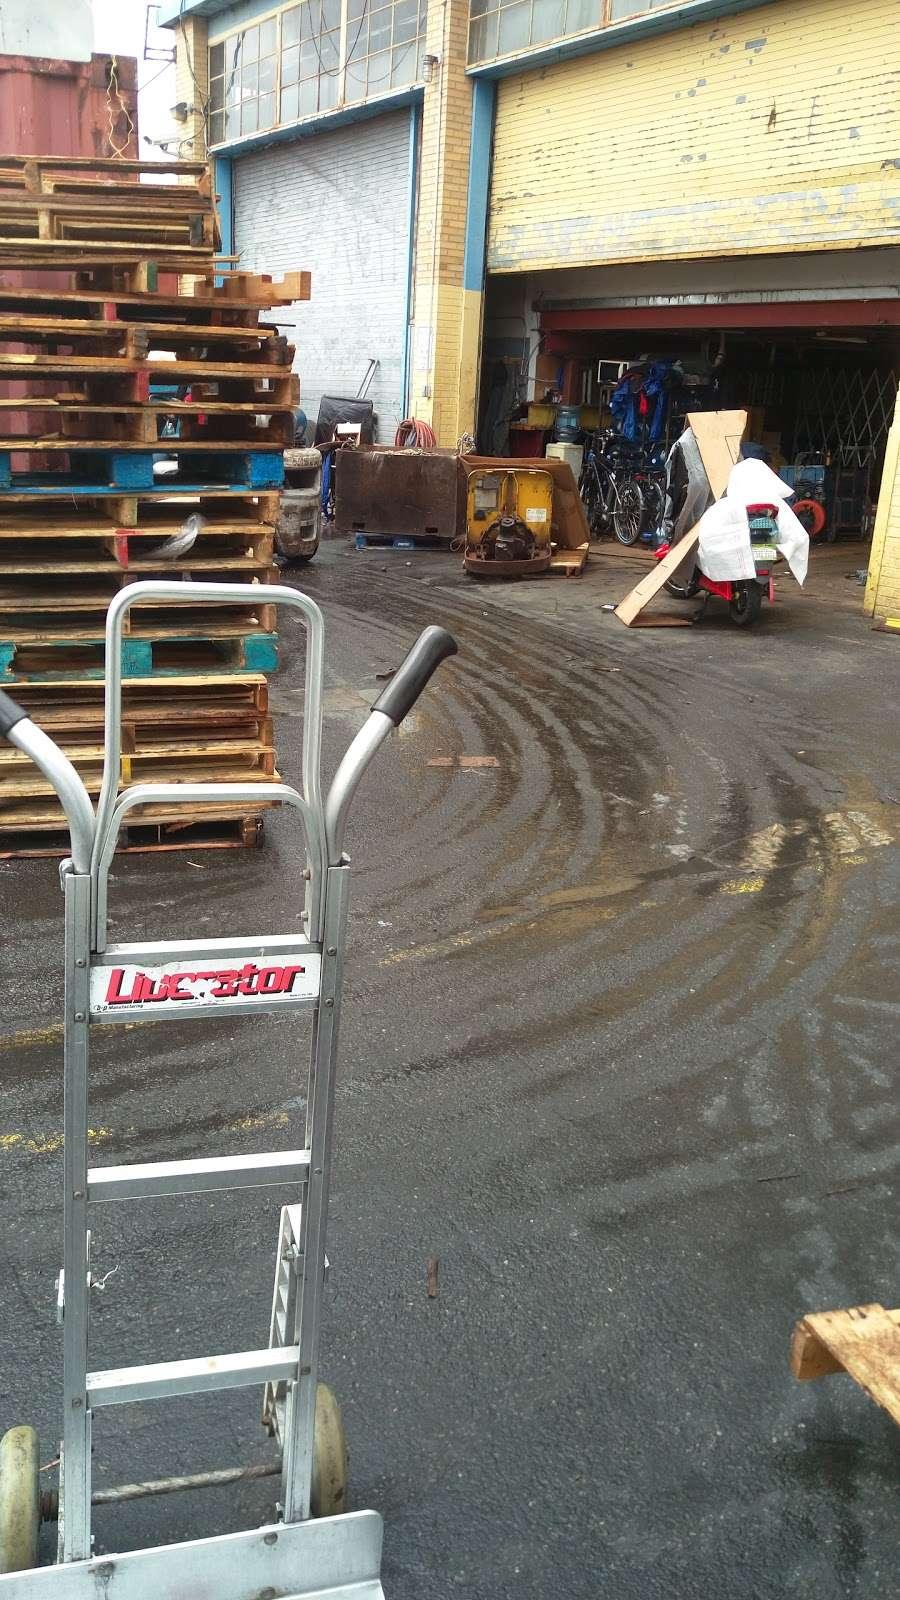 Wanrong Trading Truck Docks - storage  | Photo 6 of 10 | Address: 32-27-, 32-45 Hunters Point Ave, Long Island City, NY 11101, USA | Phone: (718) 361-8882